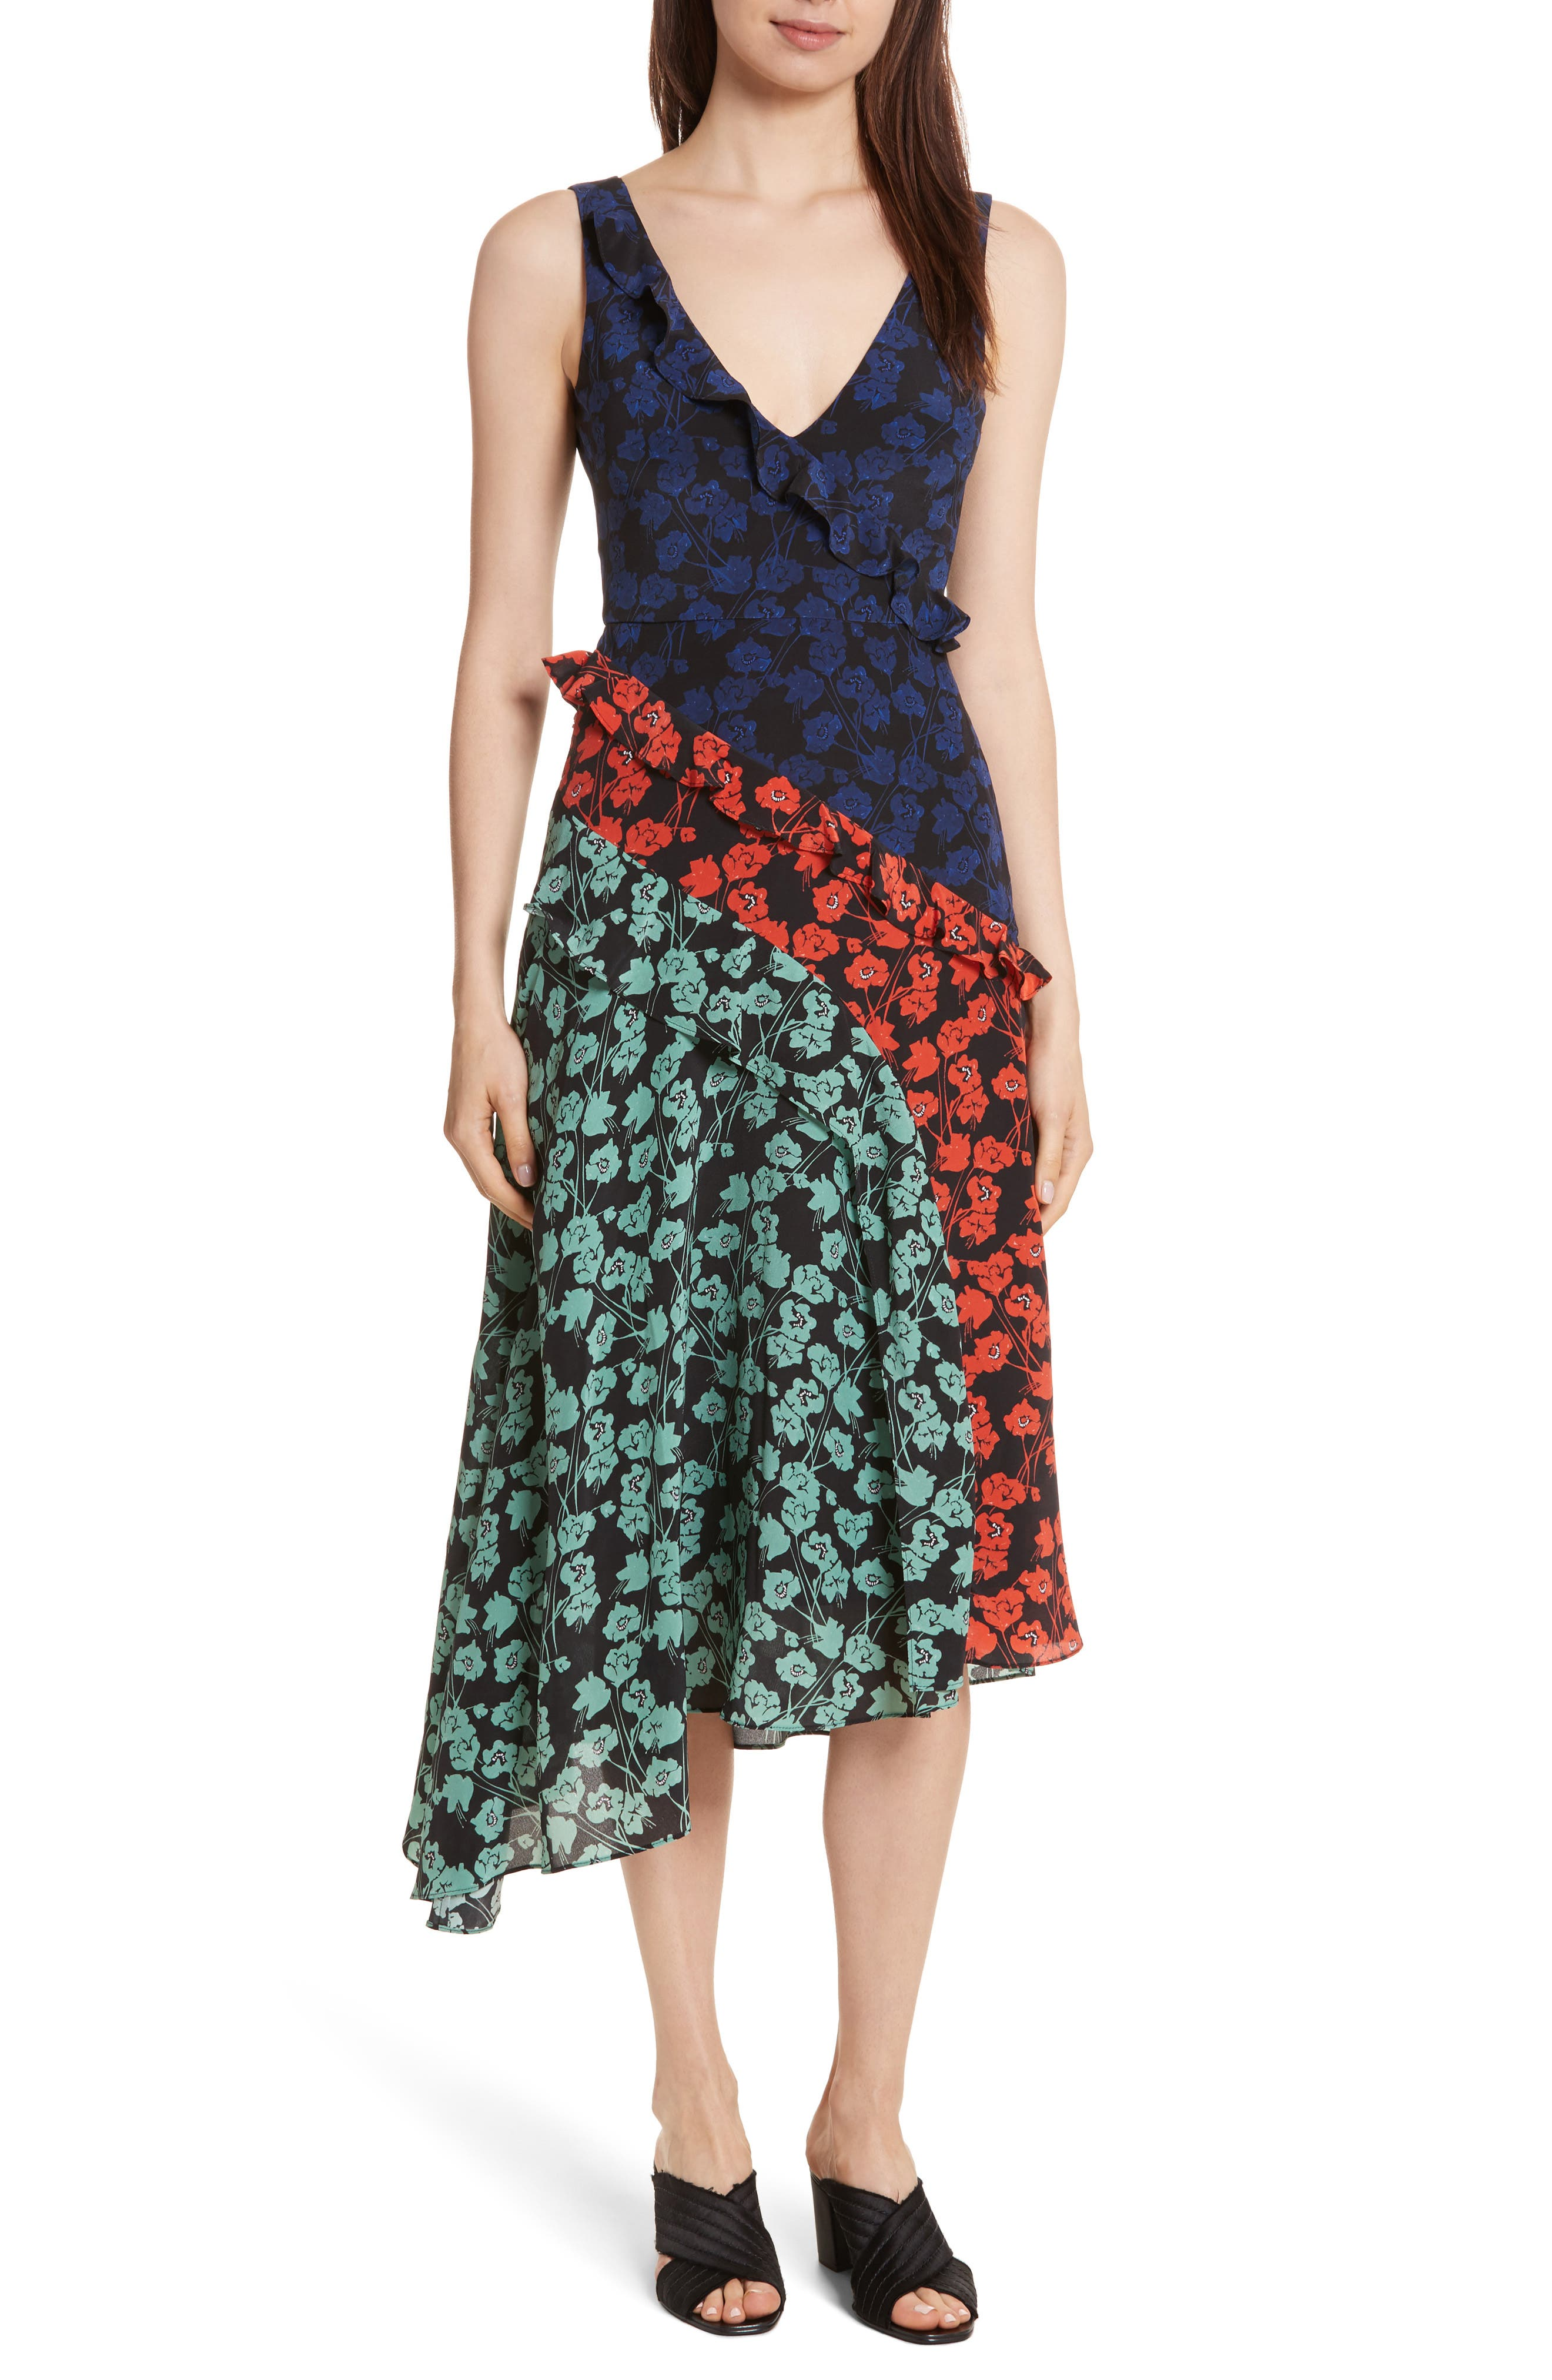 Aggie Floral Print Silk Dress,                             Main thumbnail 1, color,                             465